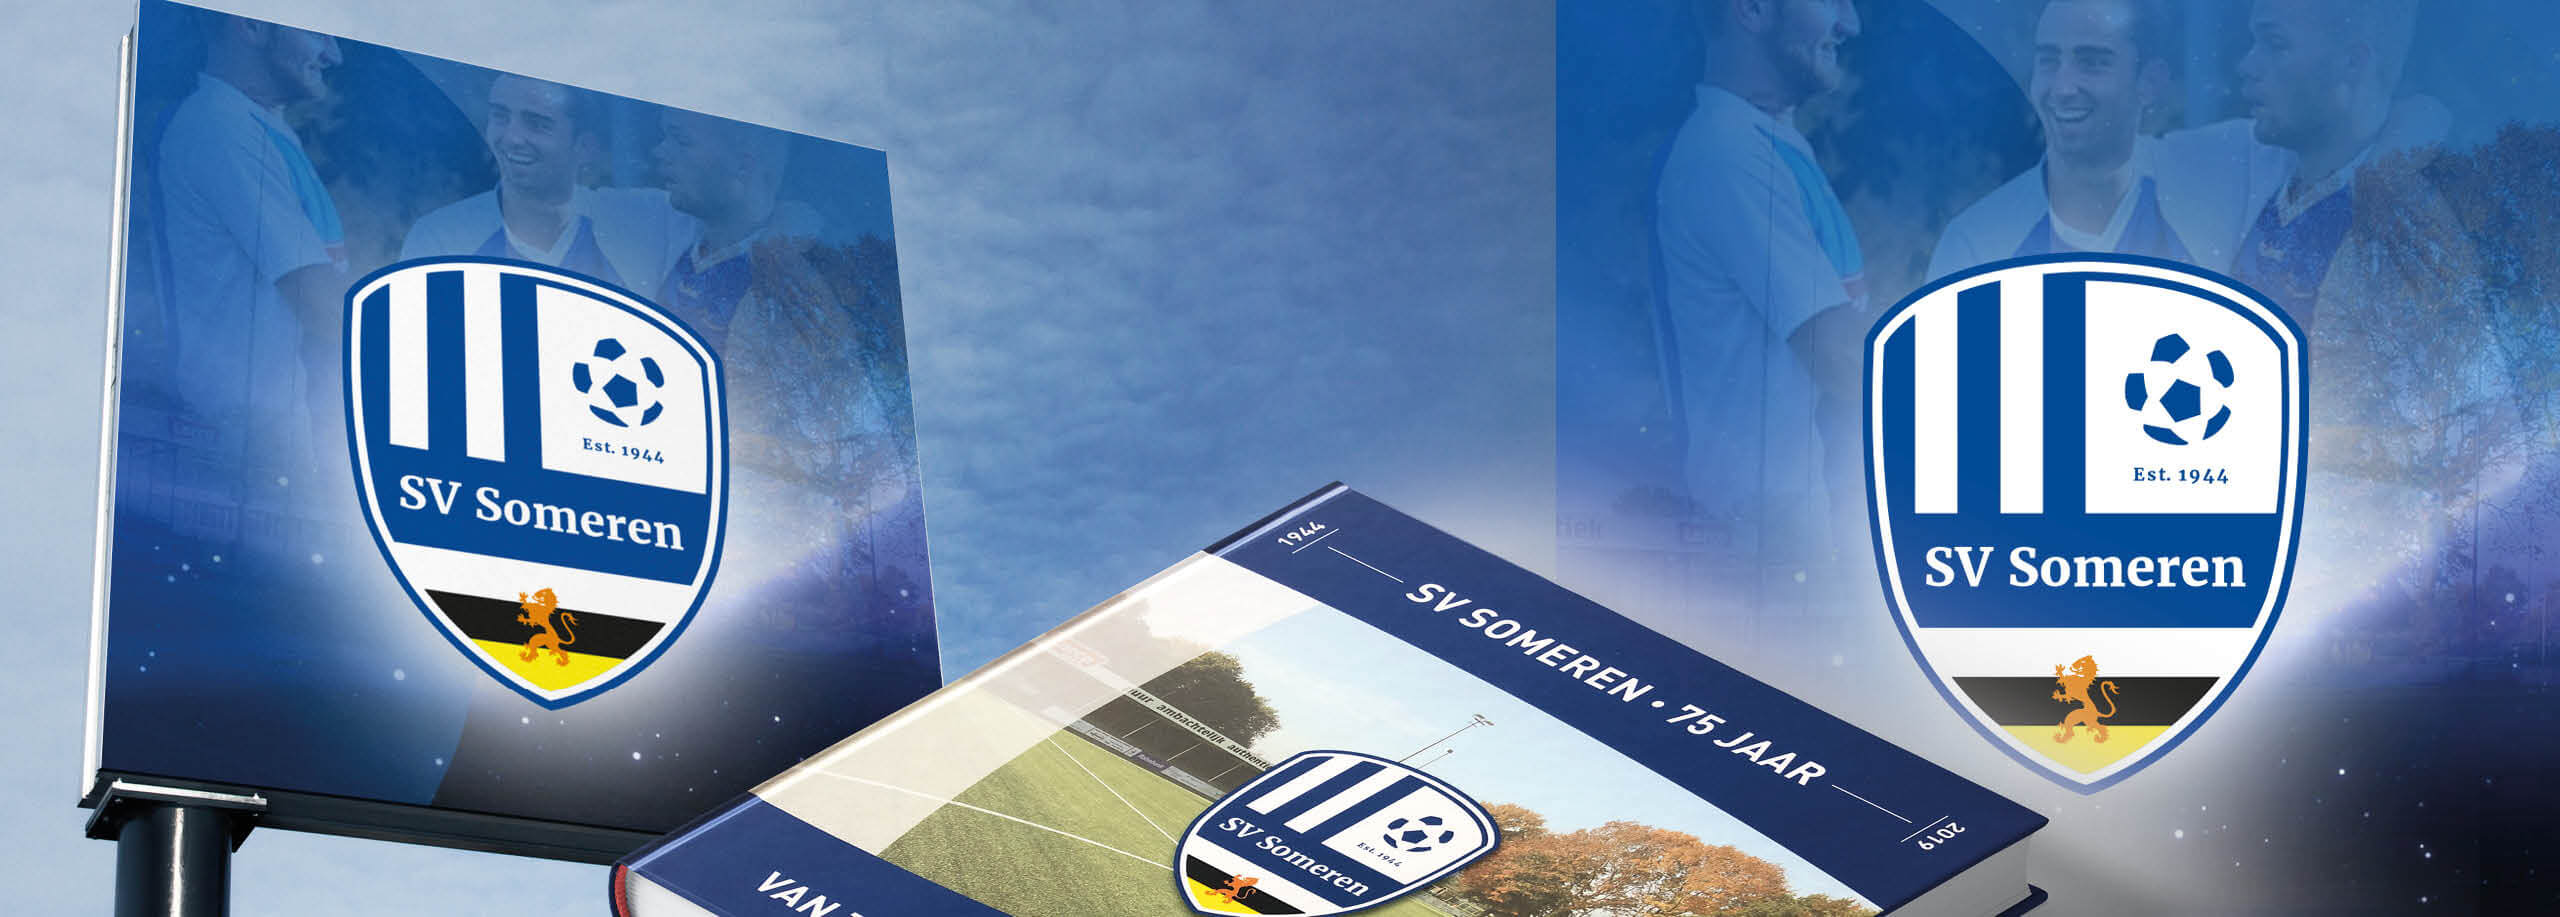 SV_Someren_Logo_ontwerp_banner